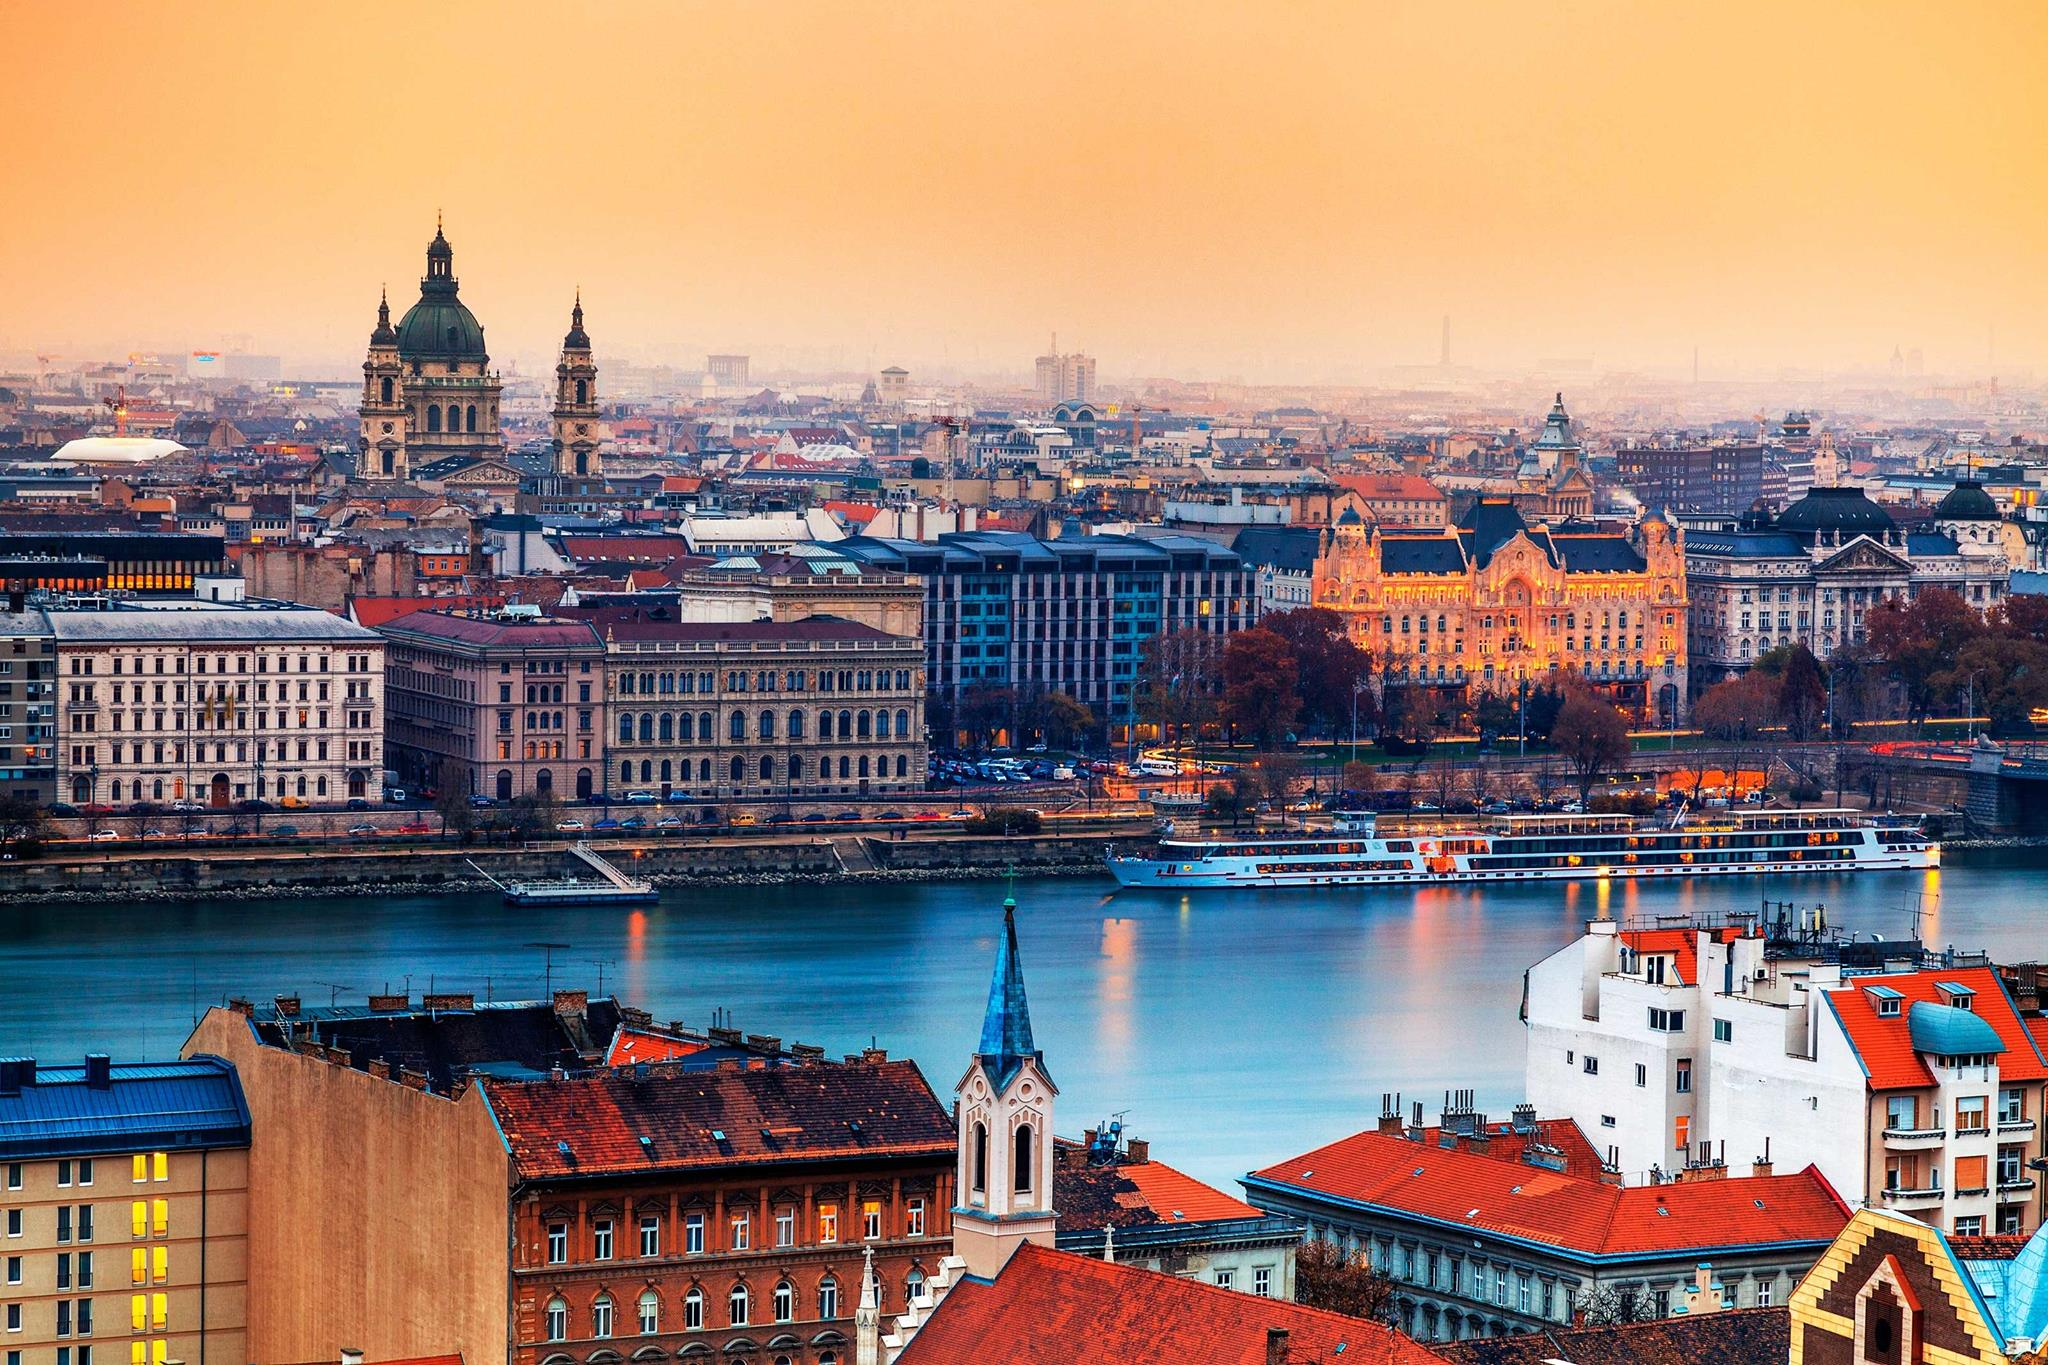 FoitiTrips: Βουδαπέστη, το διαμάντι του Δούναβη - citycampus